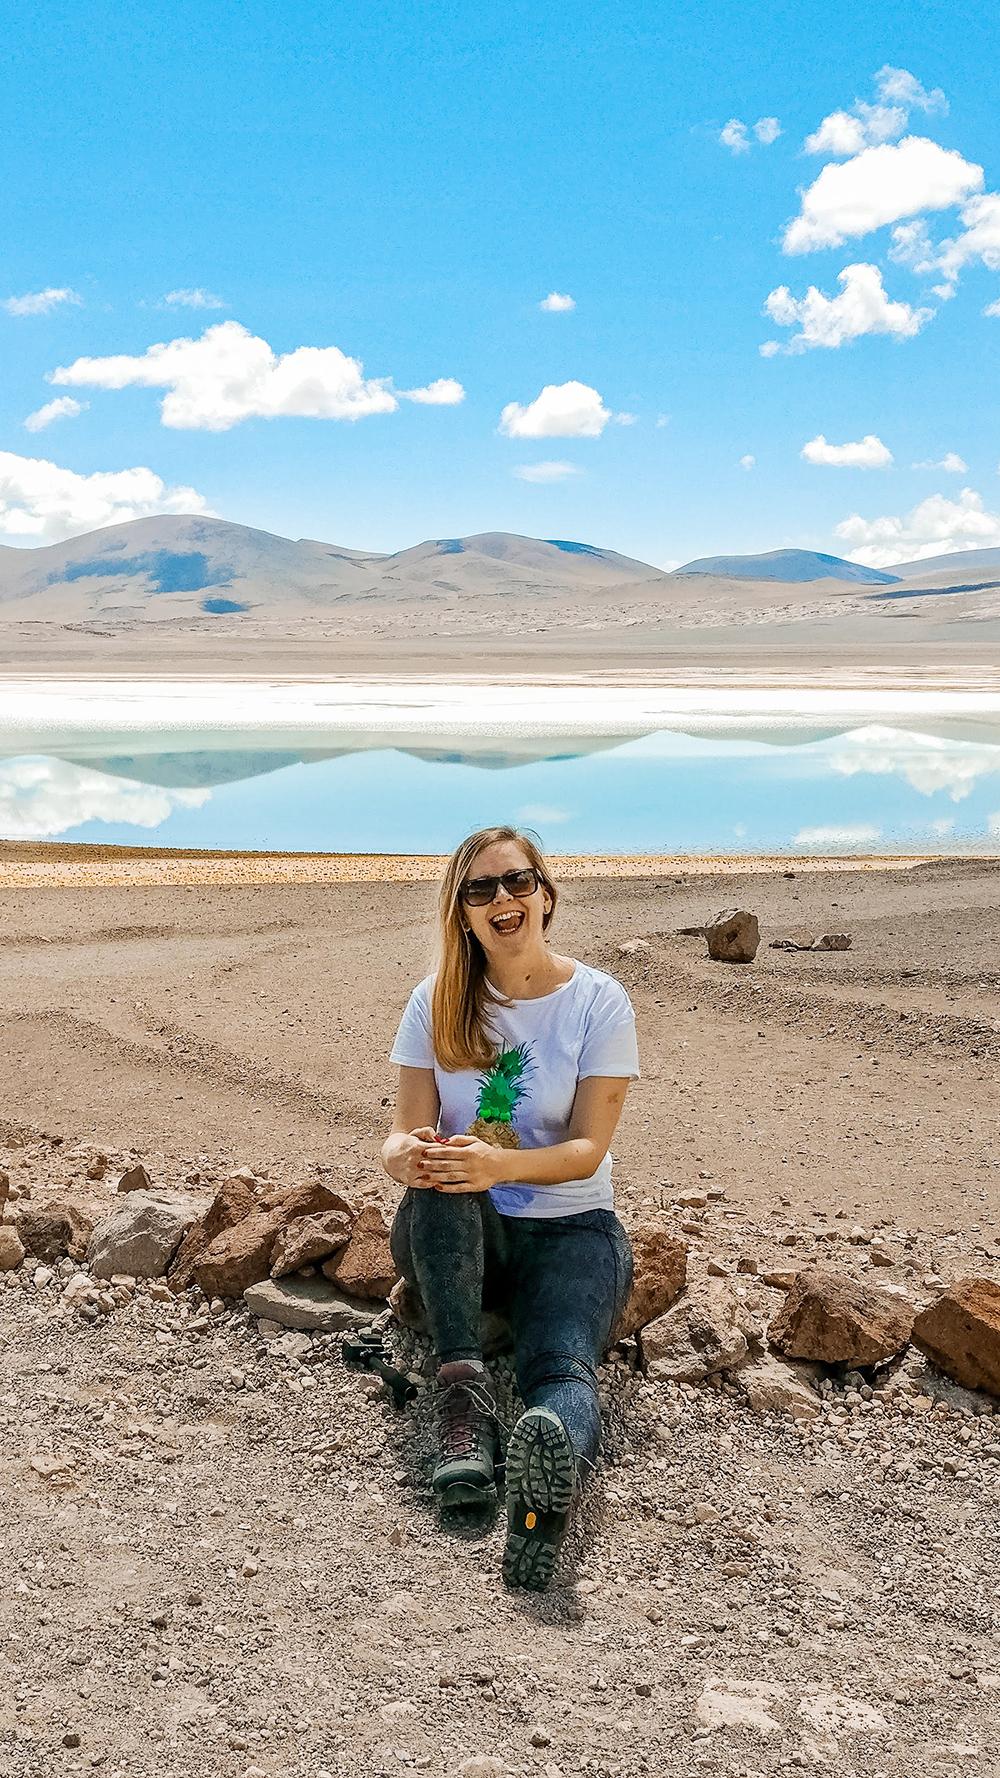 Laguna Tuyajto - How to plan your perfect trip to San Pedro de Atacama, Chile? | Aliz's Wonderland